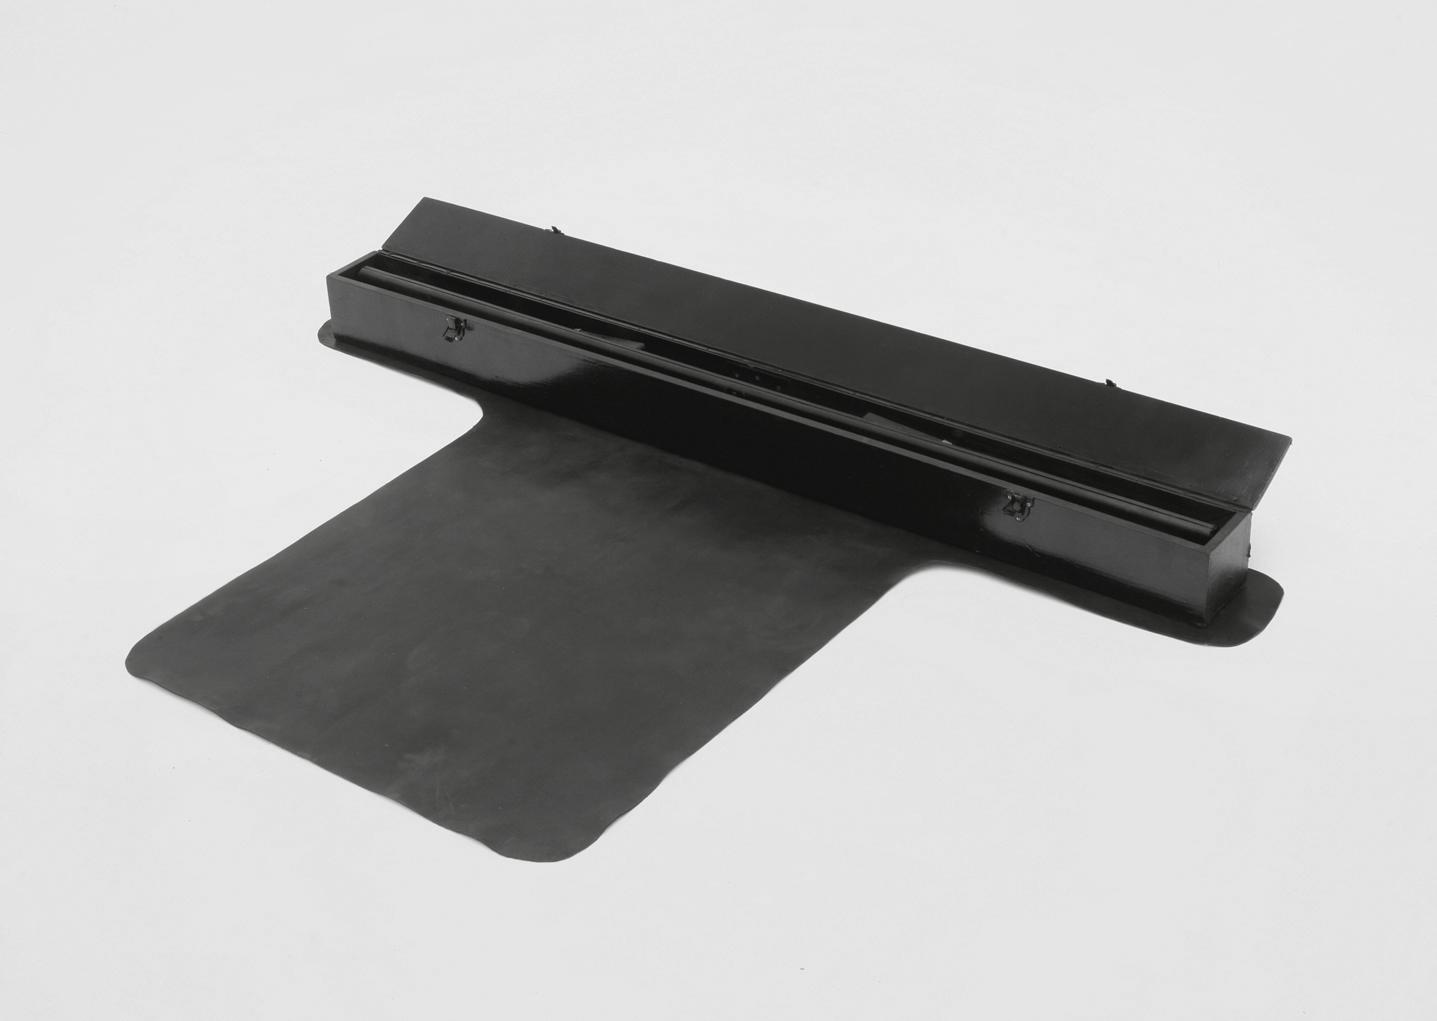 POSSESIA / Primal Elements III / 2010 / 150 x 18 x 100 cm / roller screen, leather